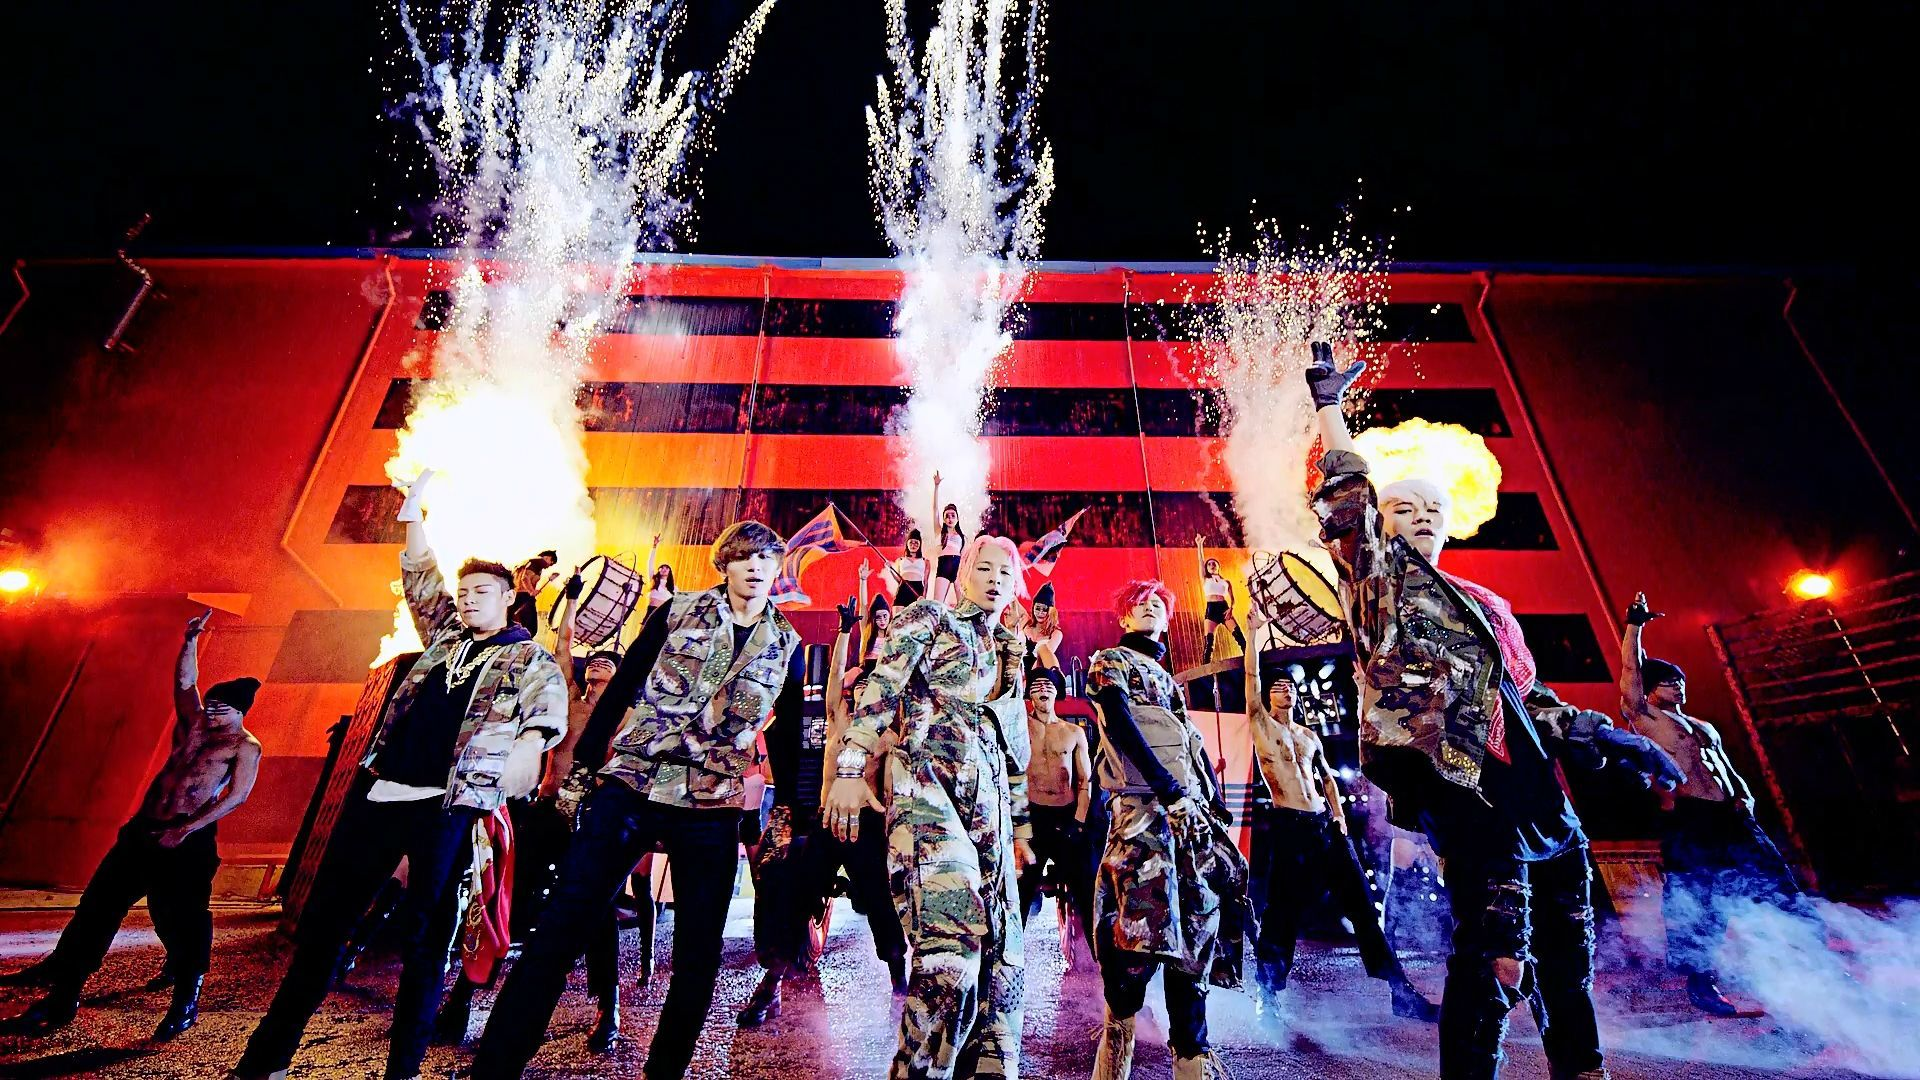 YG Entertainment / BIGBANG's Official YouTube